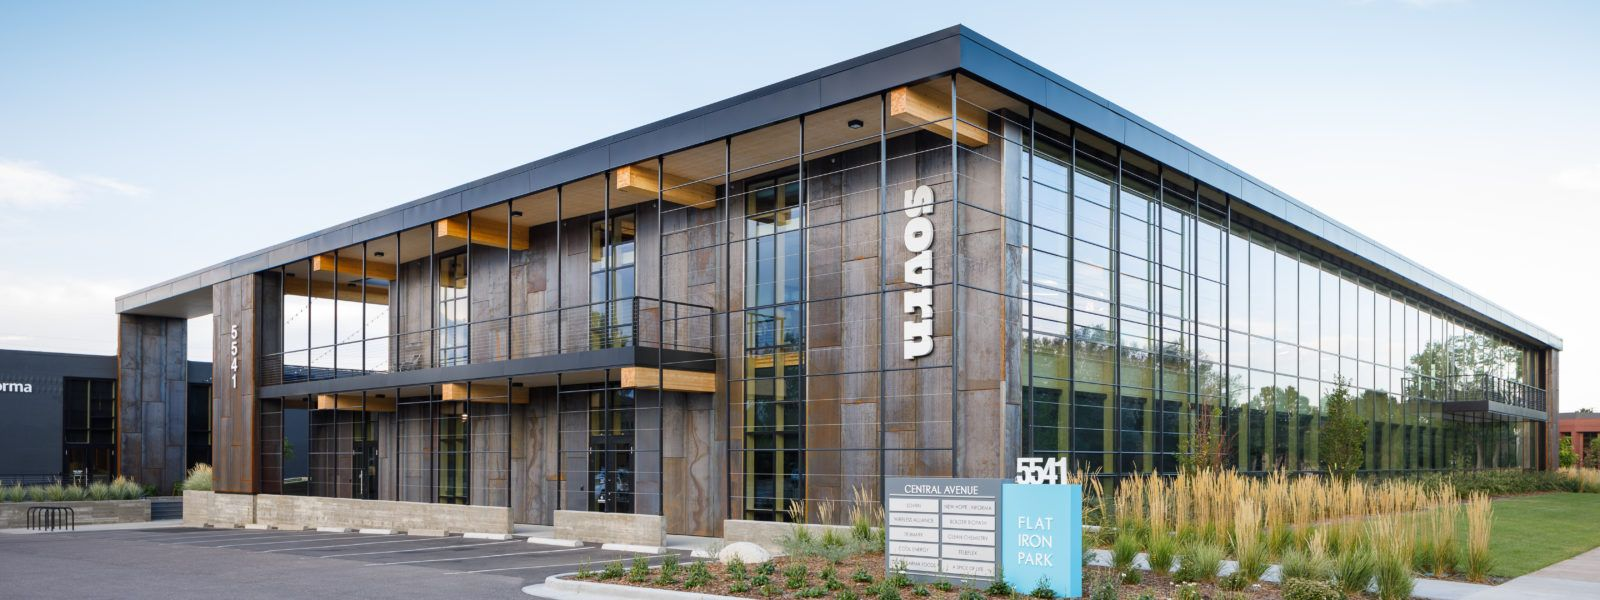 The Loading Dock Oz Architecture Architecture